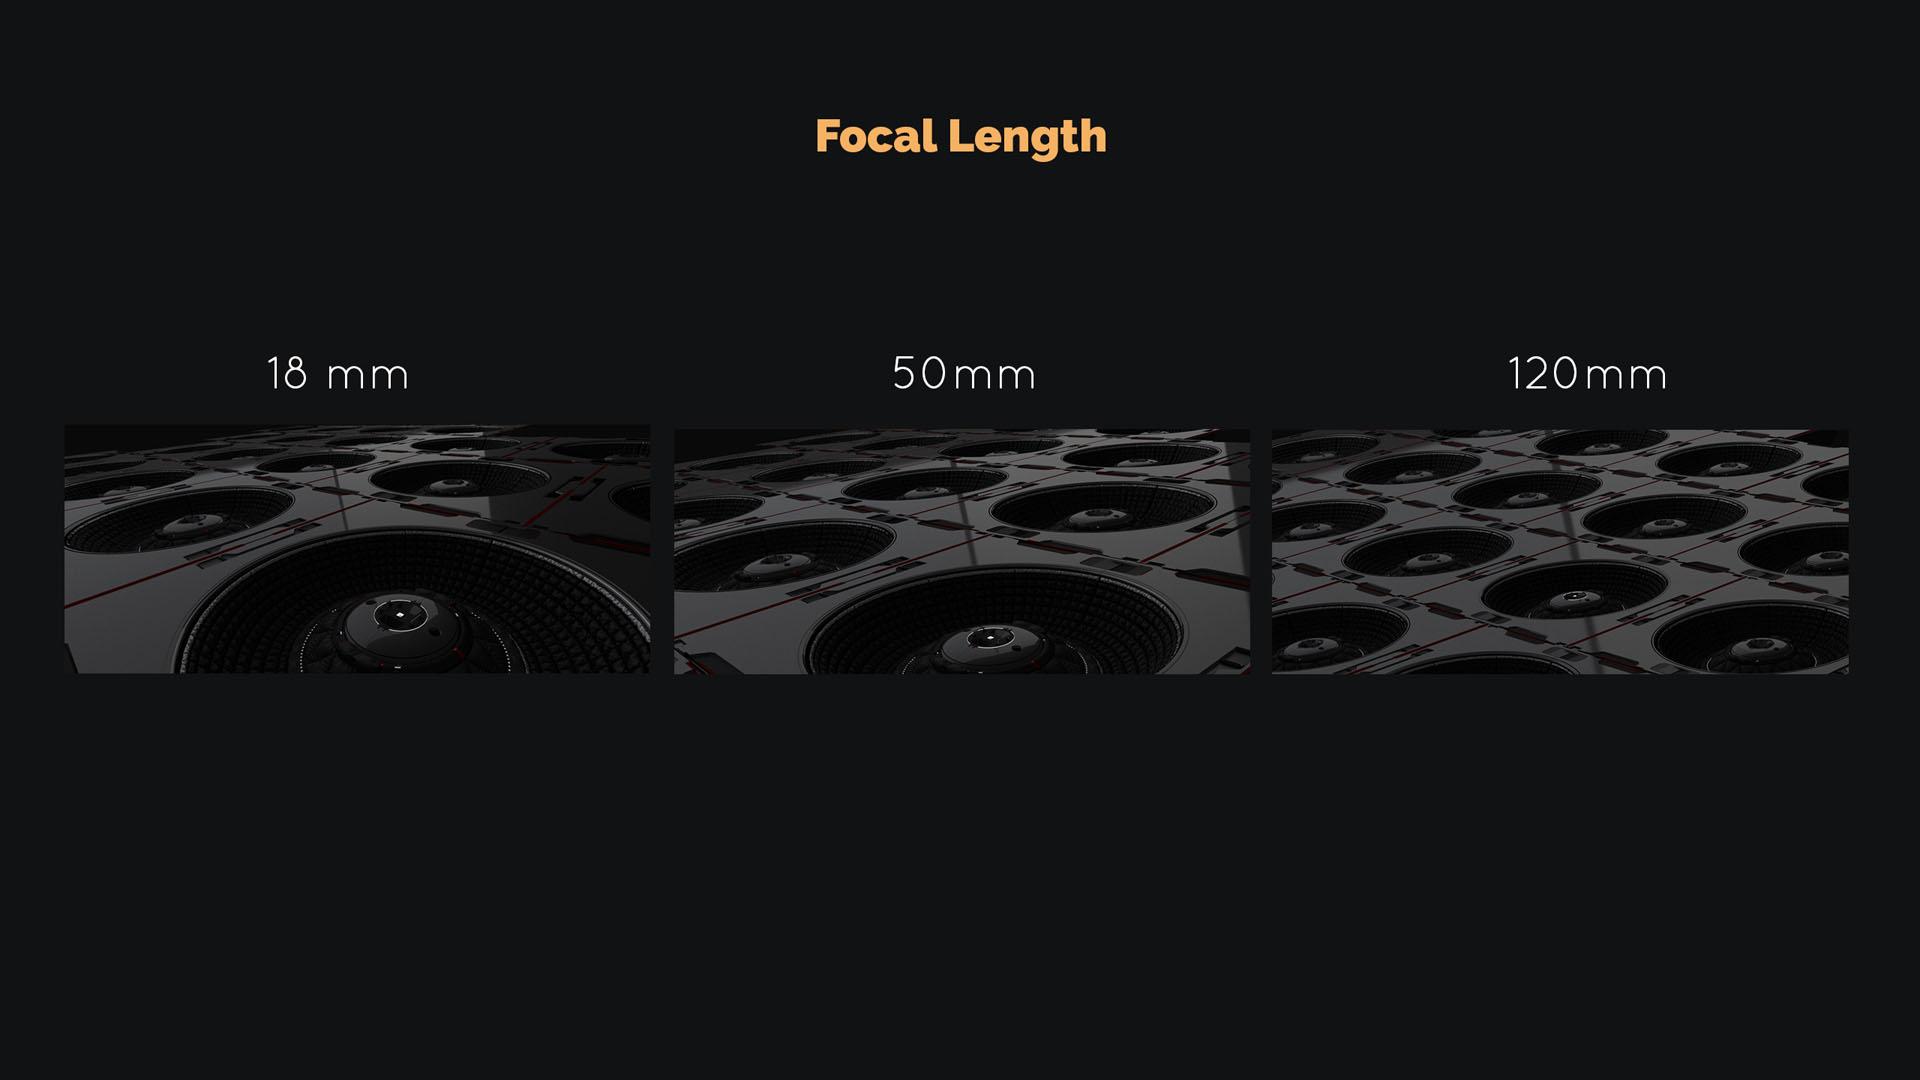 blender camera focal length